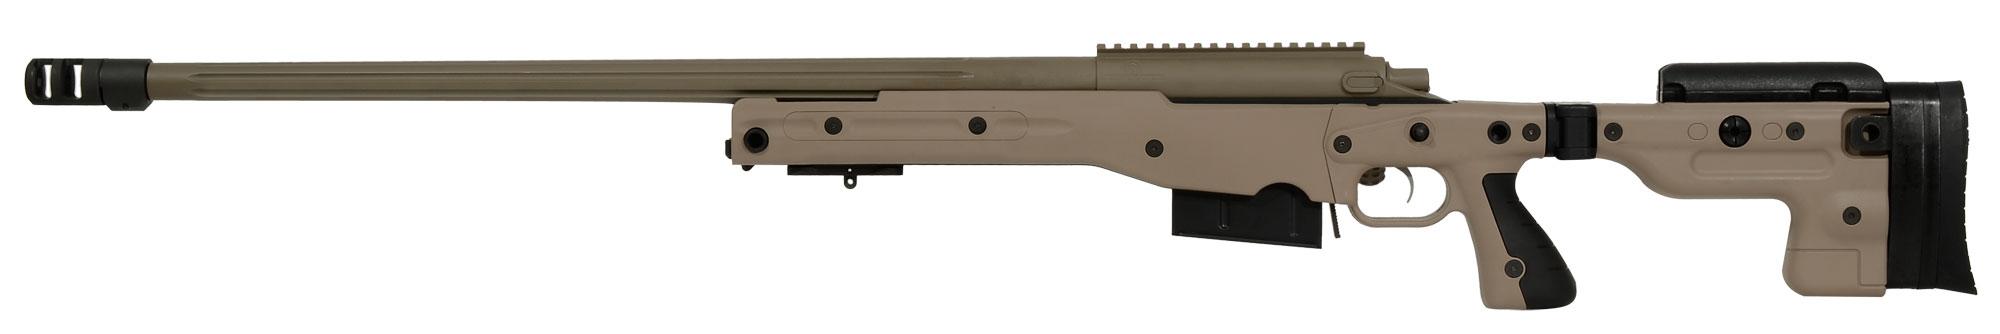 Surgeon Scalpel 300 Winchester FDE Rifle